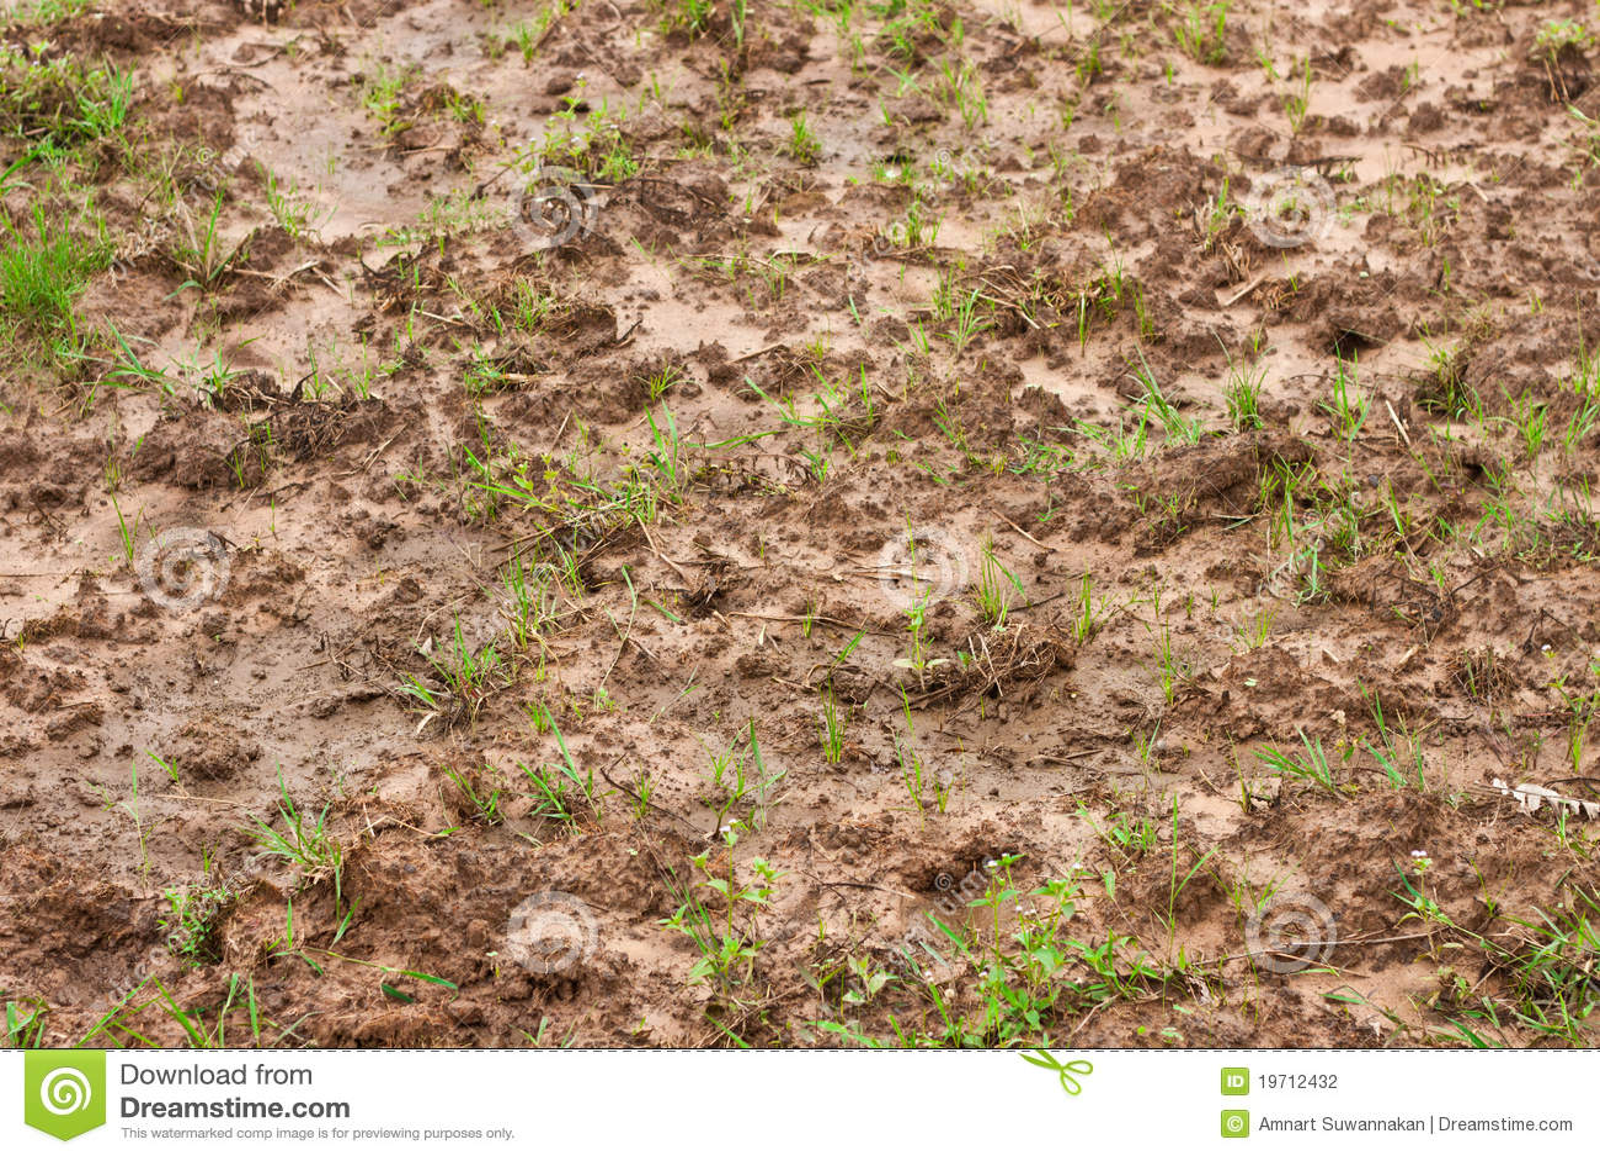 Soil stock photography image 19712432 for The soil 02joy